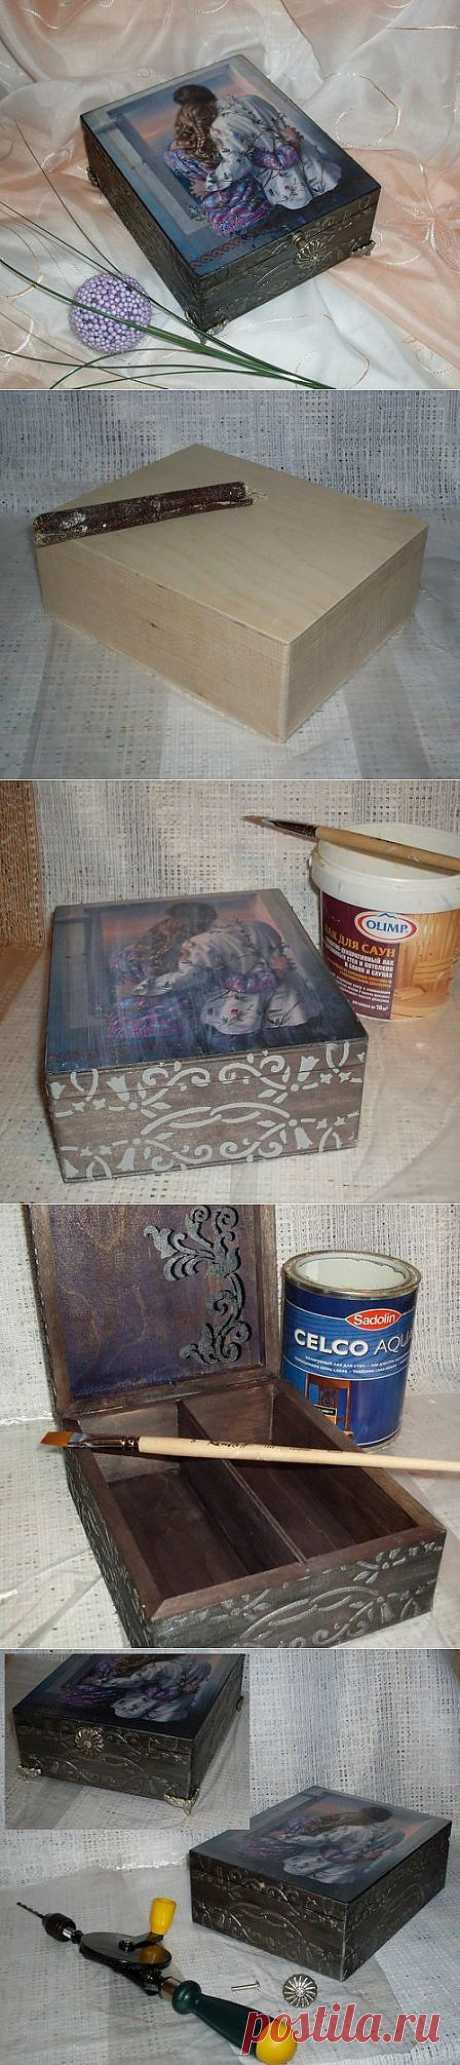 Декупаж деревянной шкатулки - мастер-класс